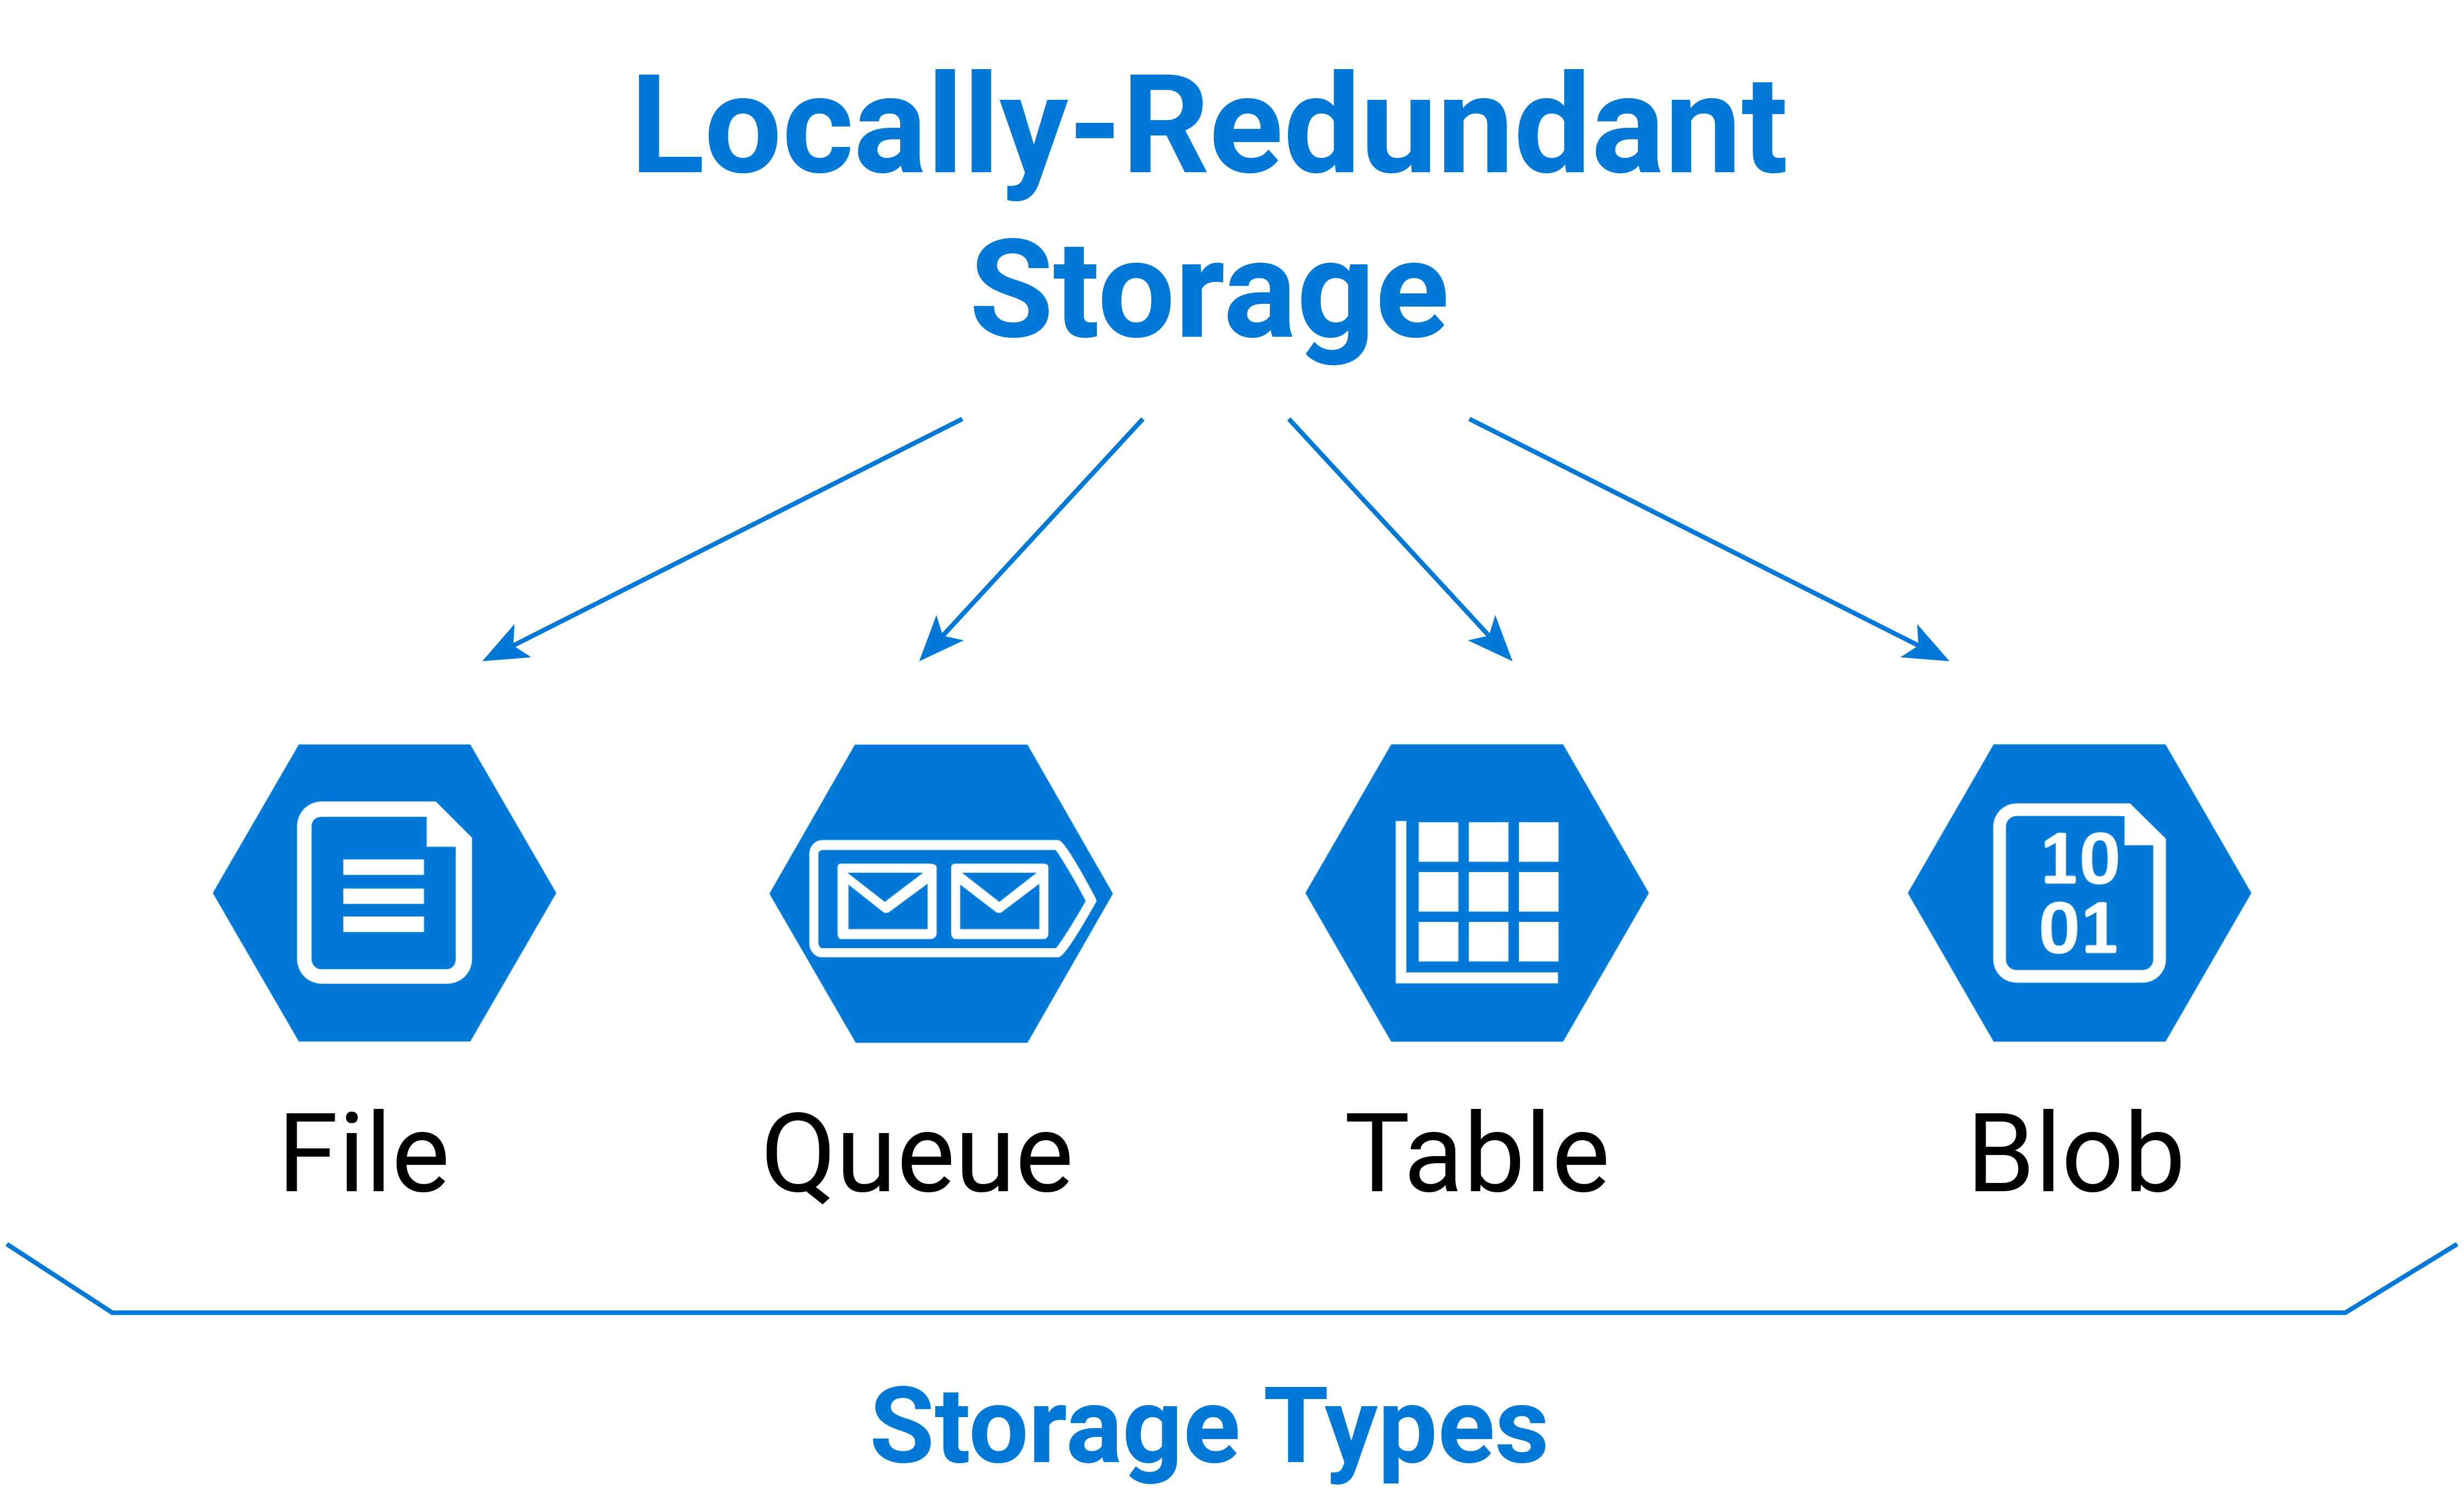 Microsoft Azure Locally-Redundant Storage Types